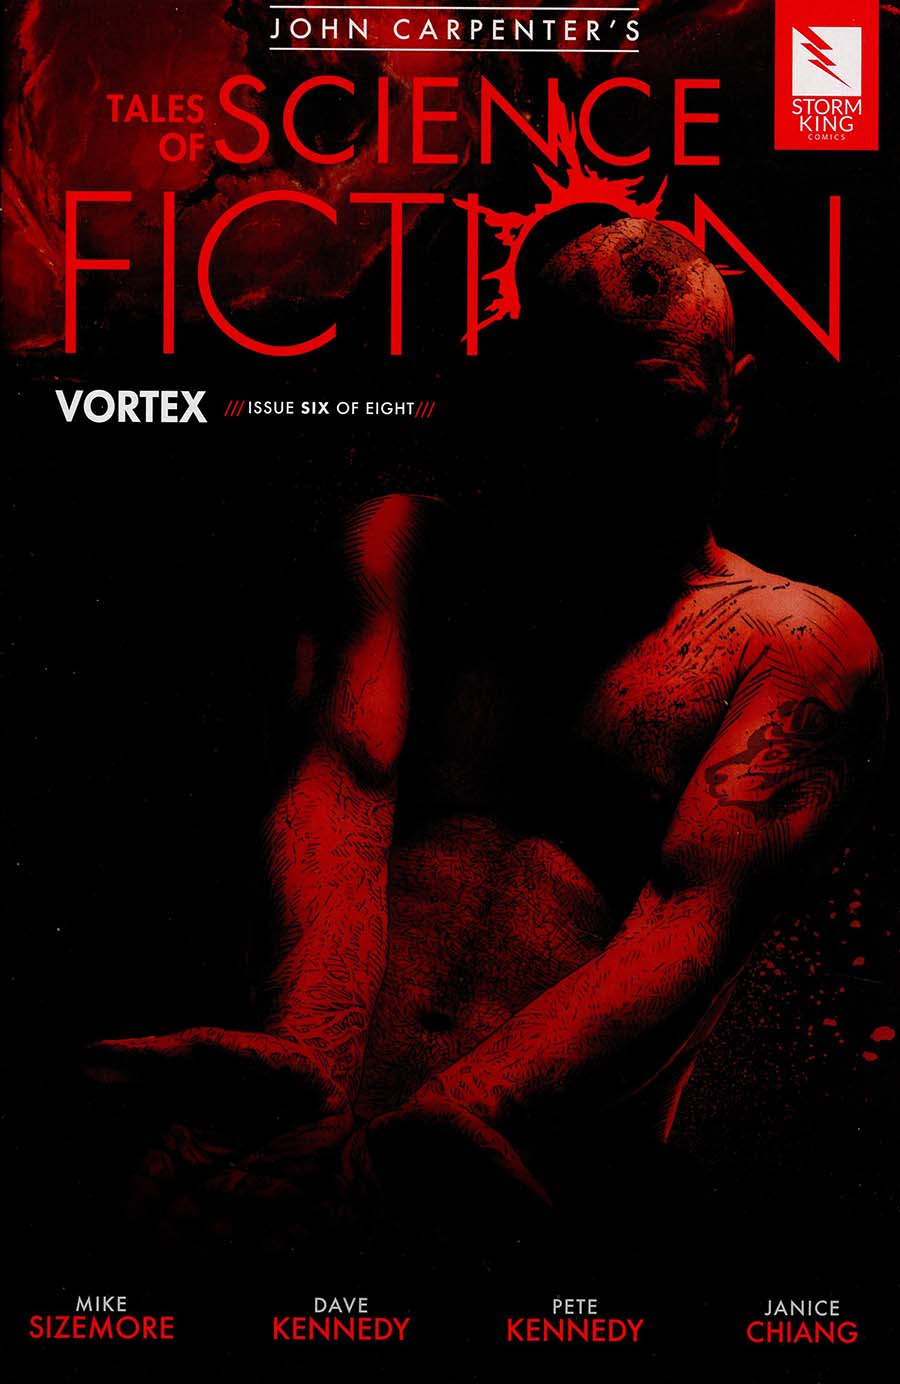 John Carpenters Tales Of Science Fiction Vortex #6